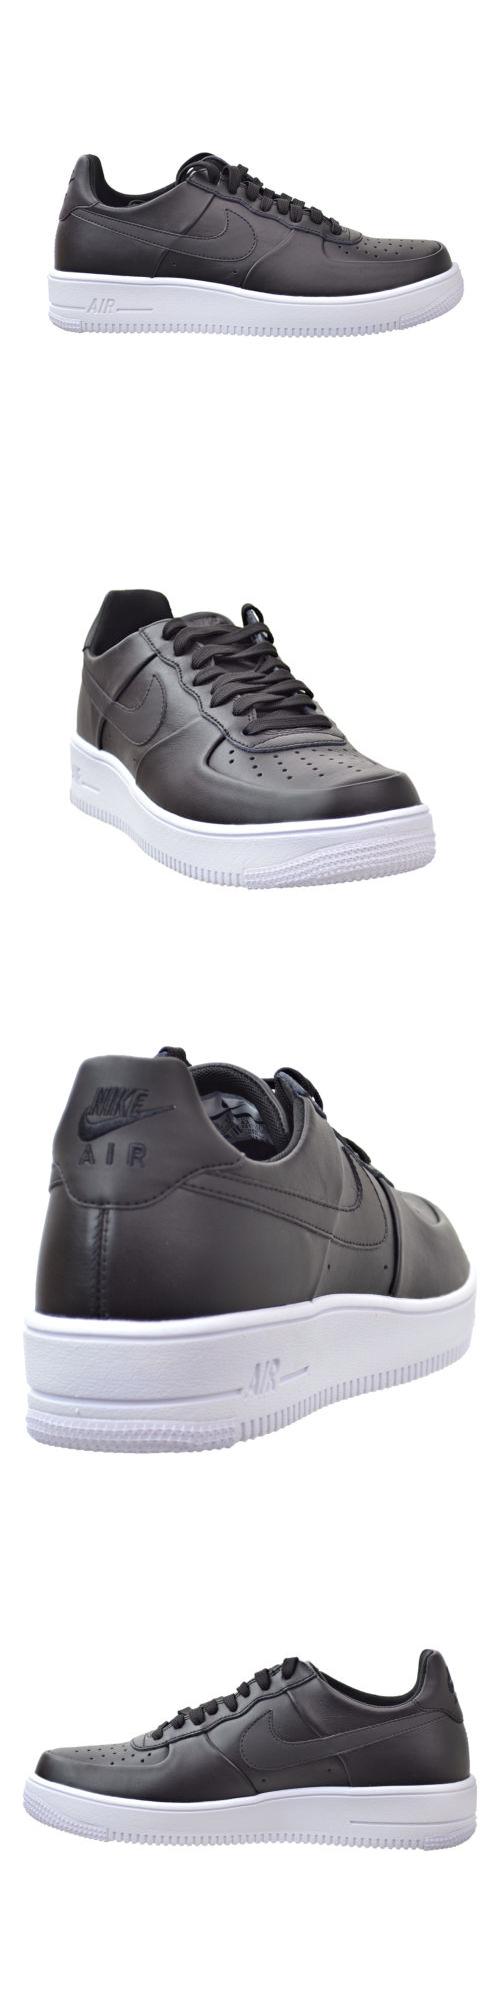 gli uomini le scarpe nike air force: 1 ultraforce mens scarpe pelle nera